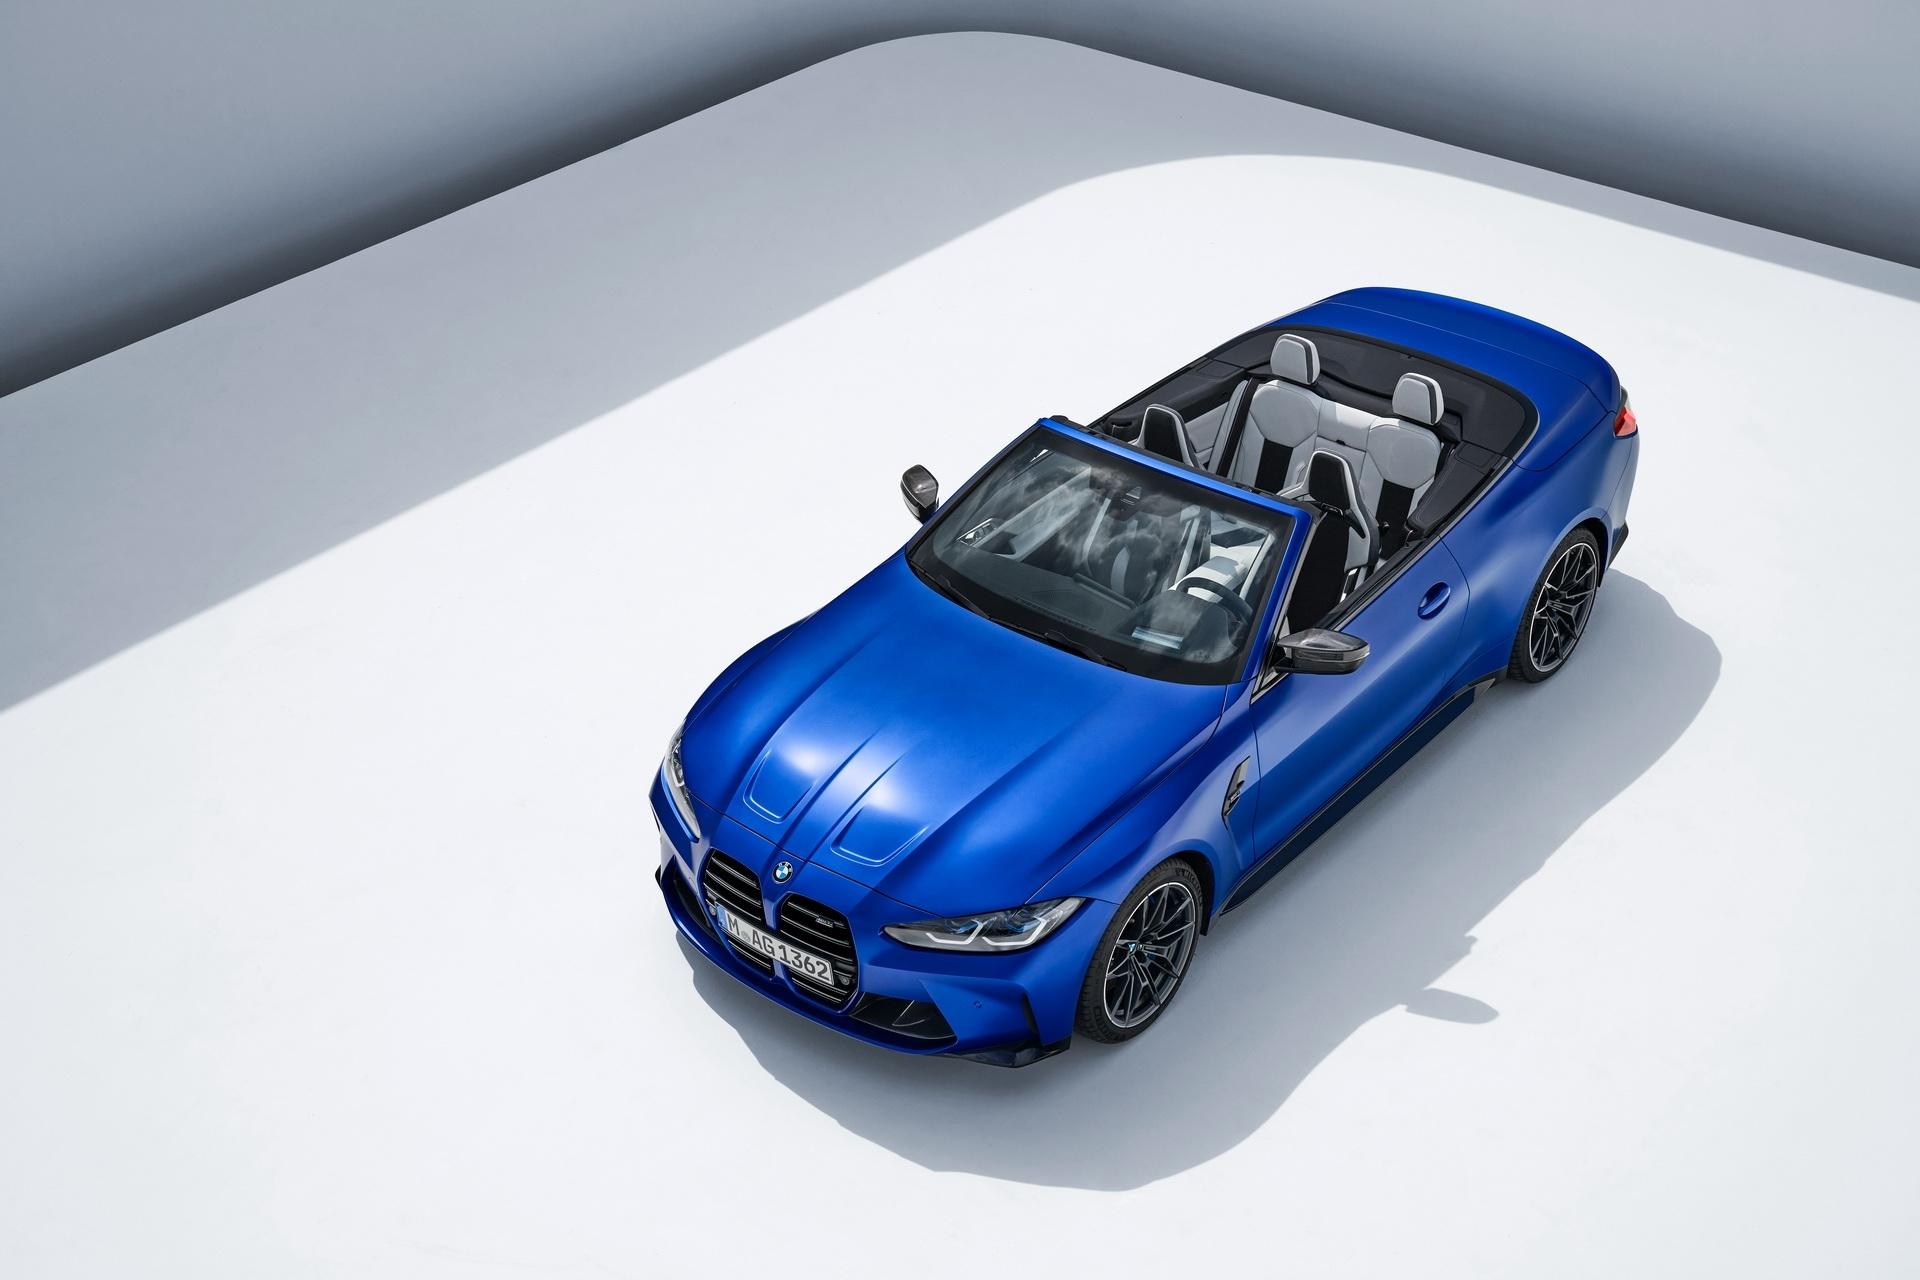 Bmw M4 Competition Cabrio 2021 0521 003